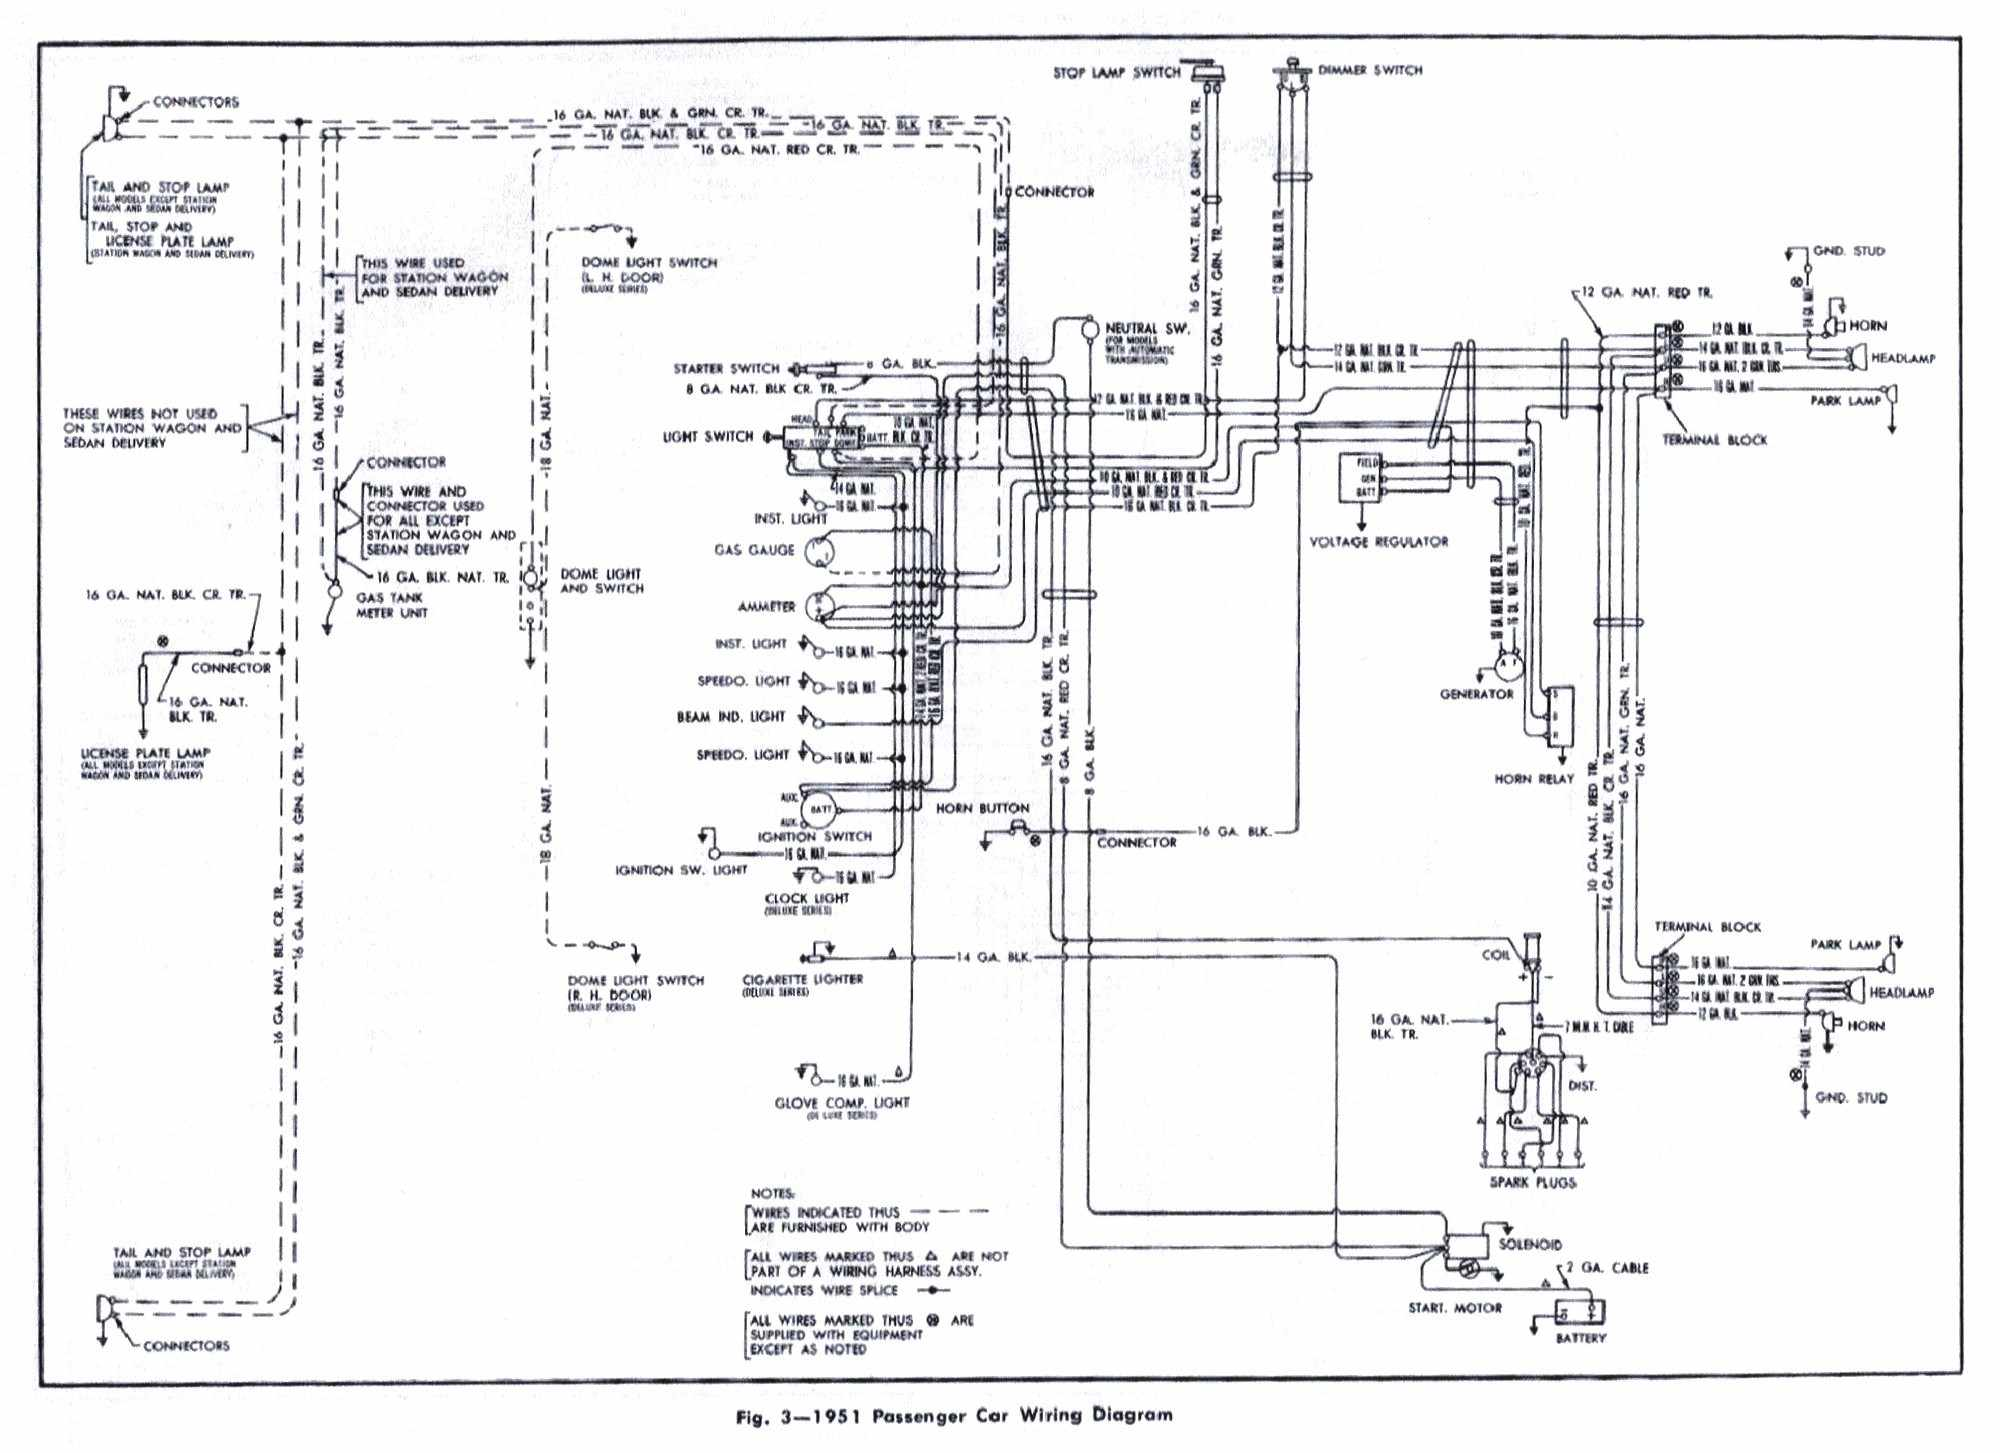 Mitsubishi Forklift Fuse Box Wiring Diagram Libraries Toyota Todaystoyota Diagrams